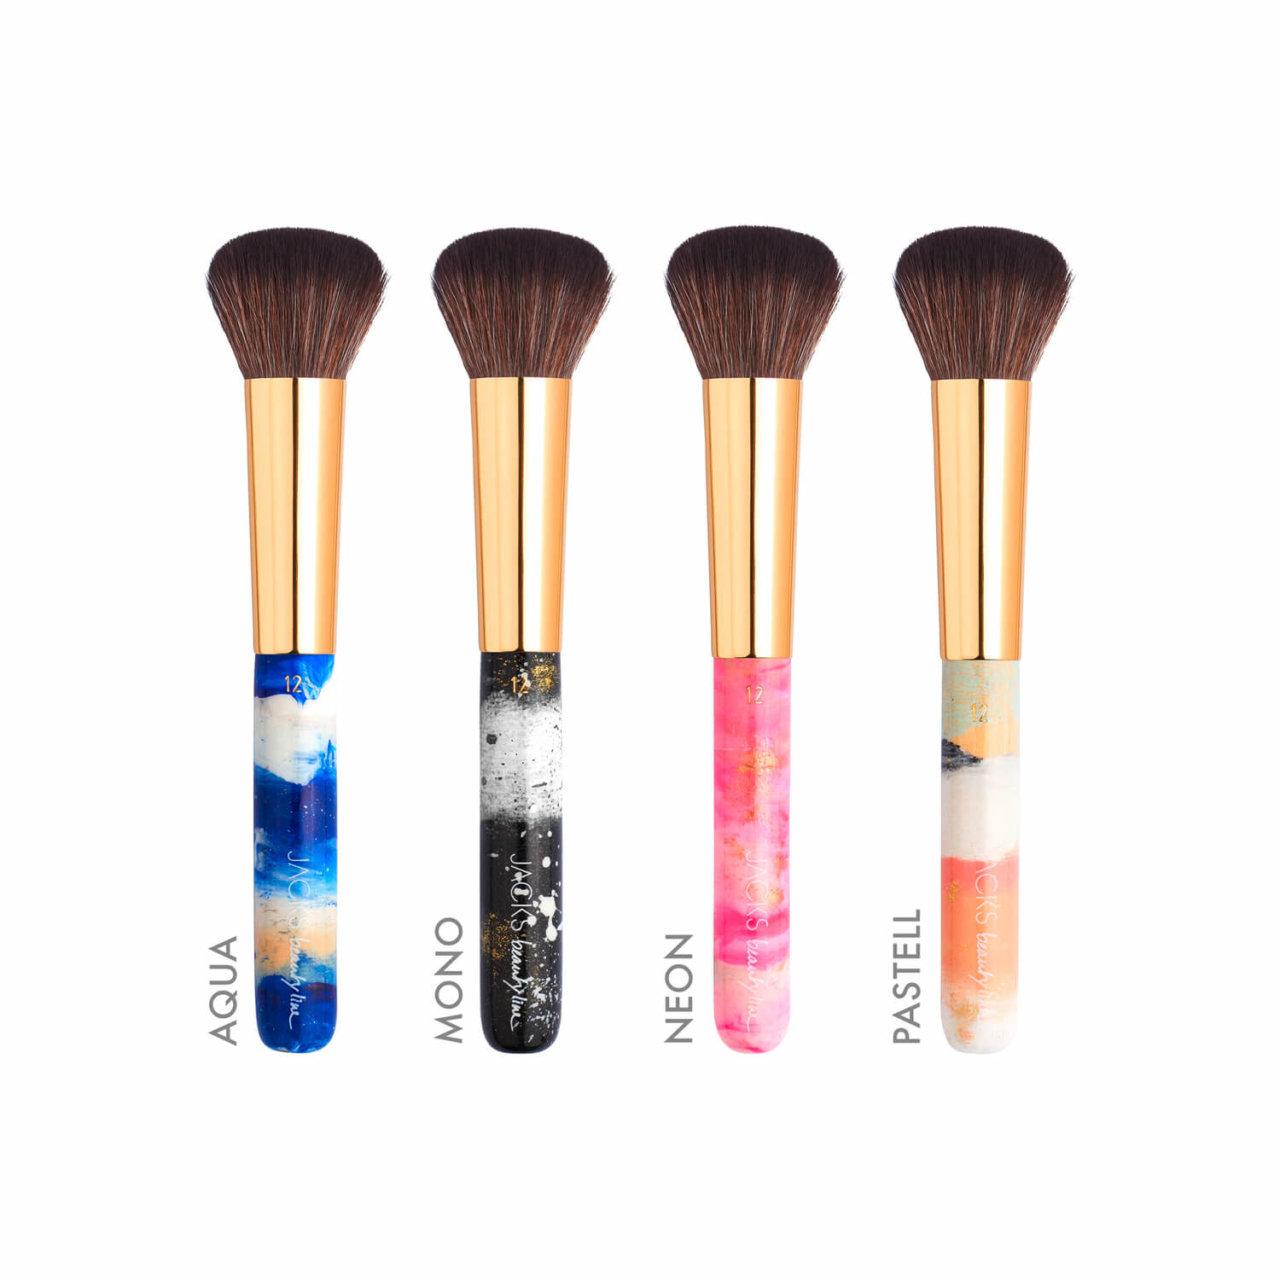 4028264502944 JACKS beautyline Brush 12